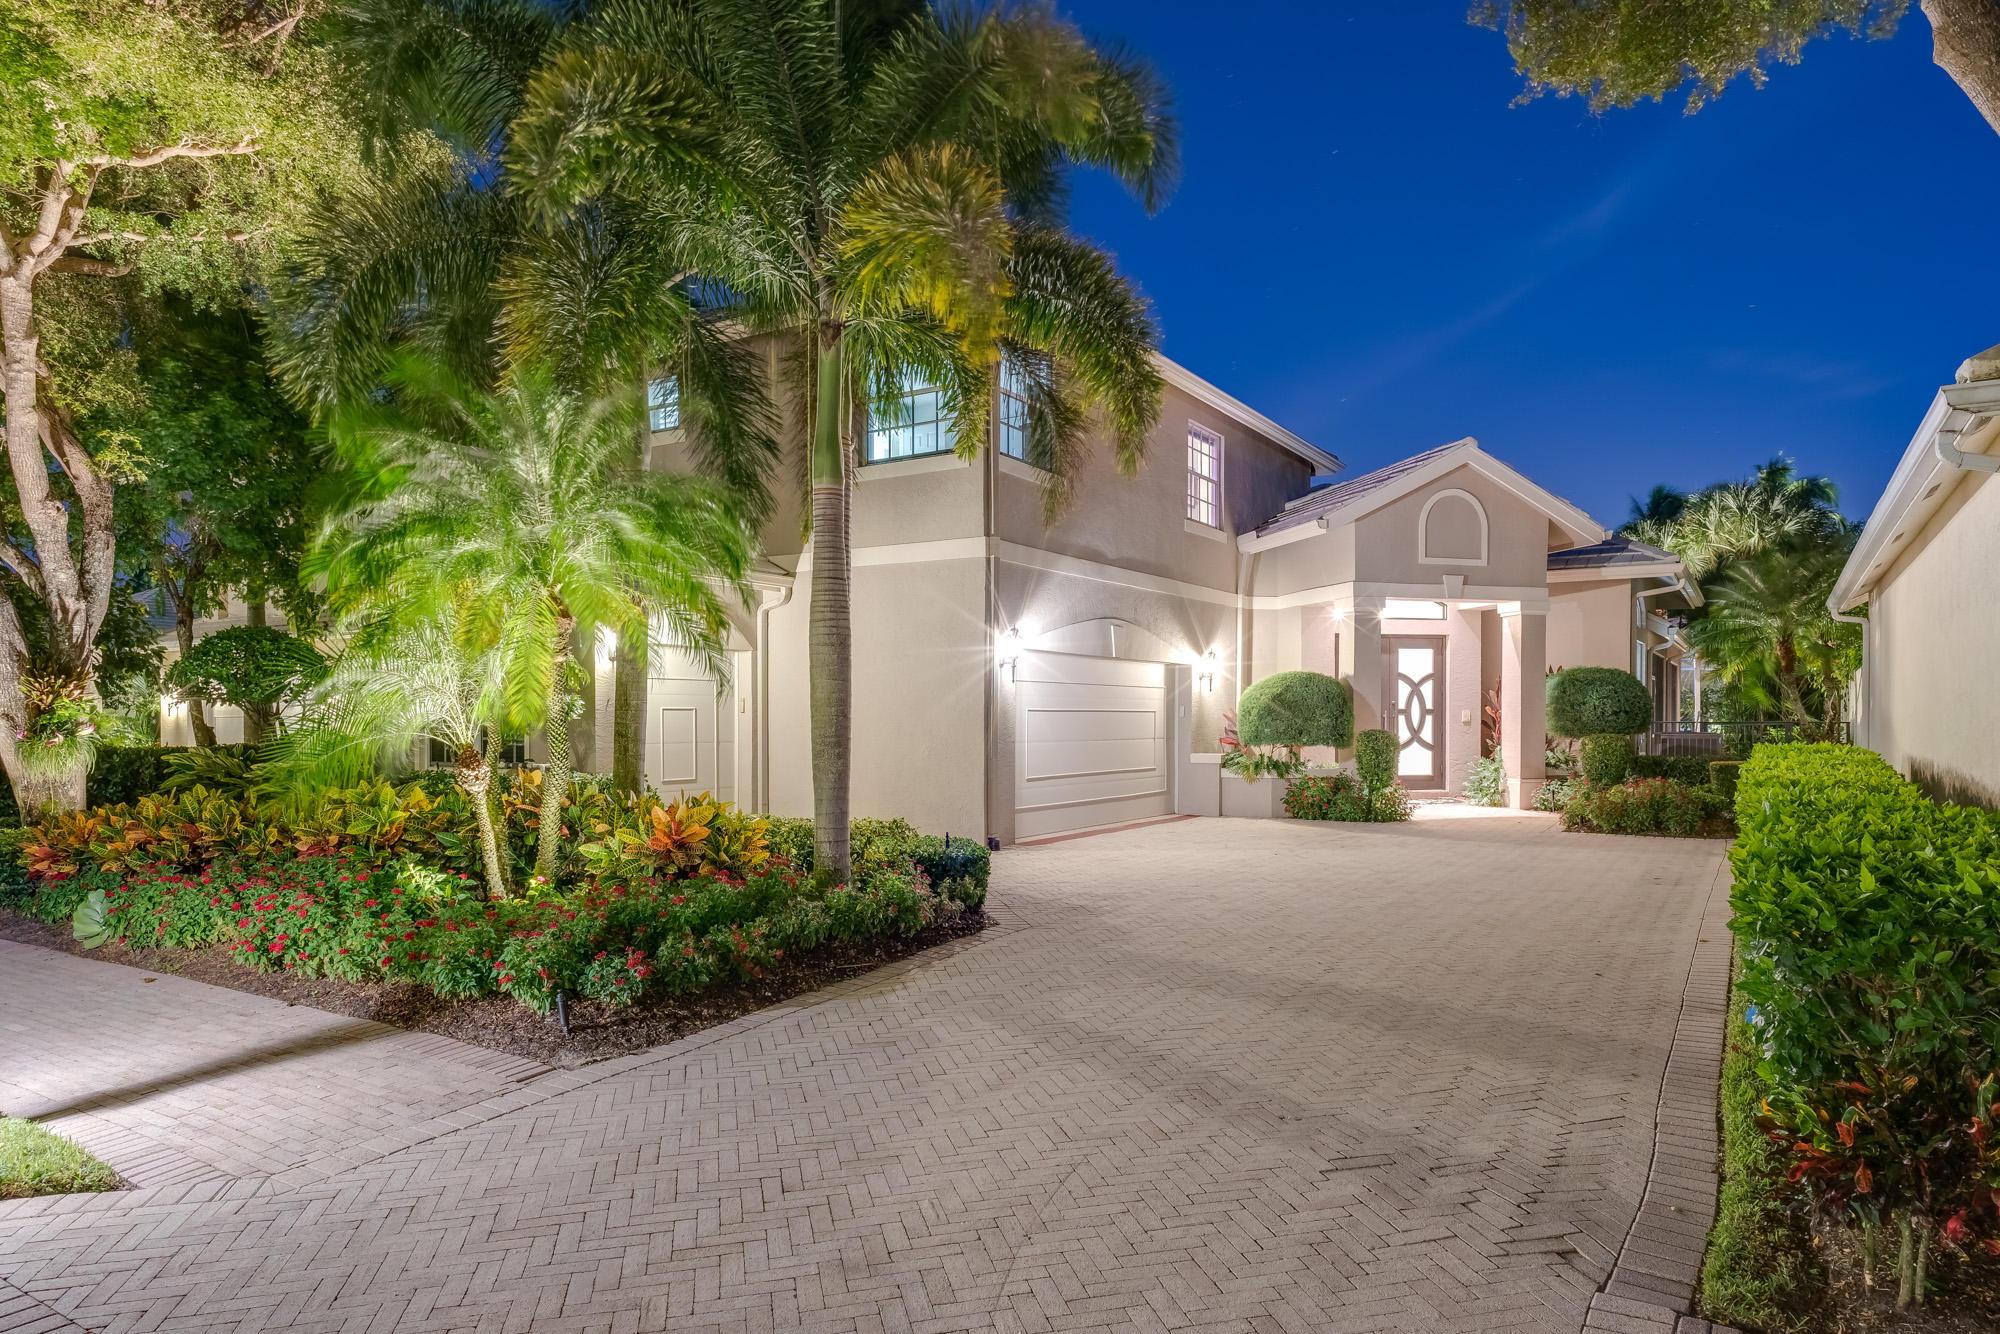 127 Victoria Bay Court, Palm Beach Gardens, Florida 33418, 3 Bedrooms Bedrooms, ,3 BathroomsBathrooms,A,Single family,Victoria Bay,RX-10479110